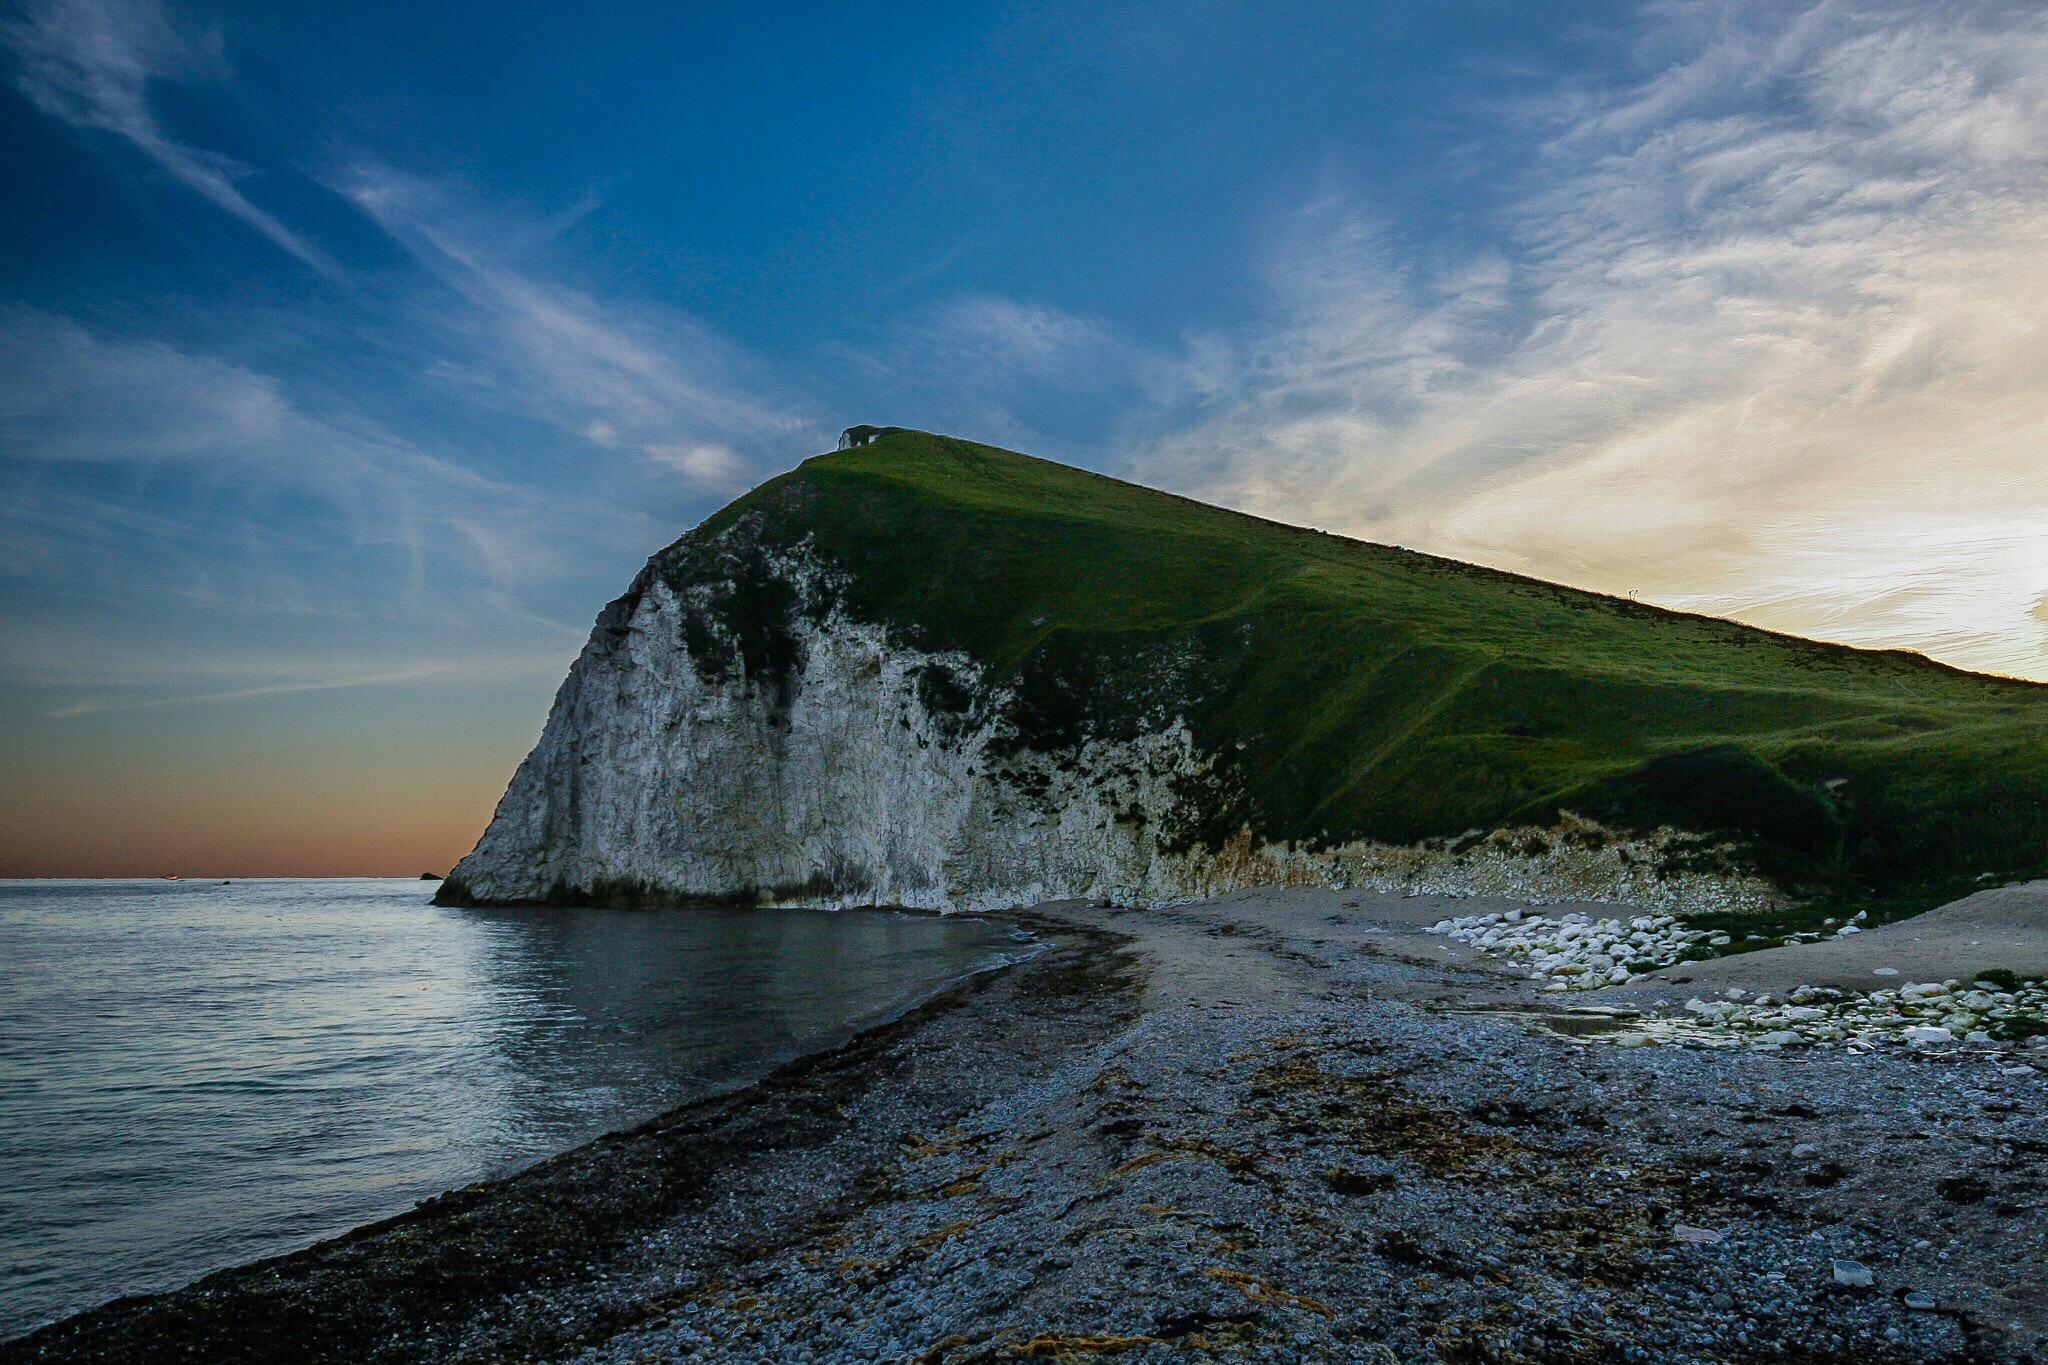 The Jurassic Coast, Dorset, take at sunset